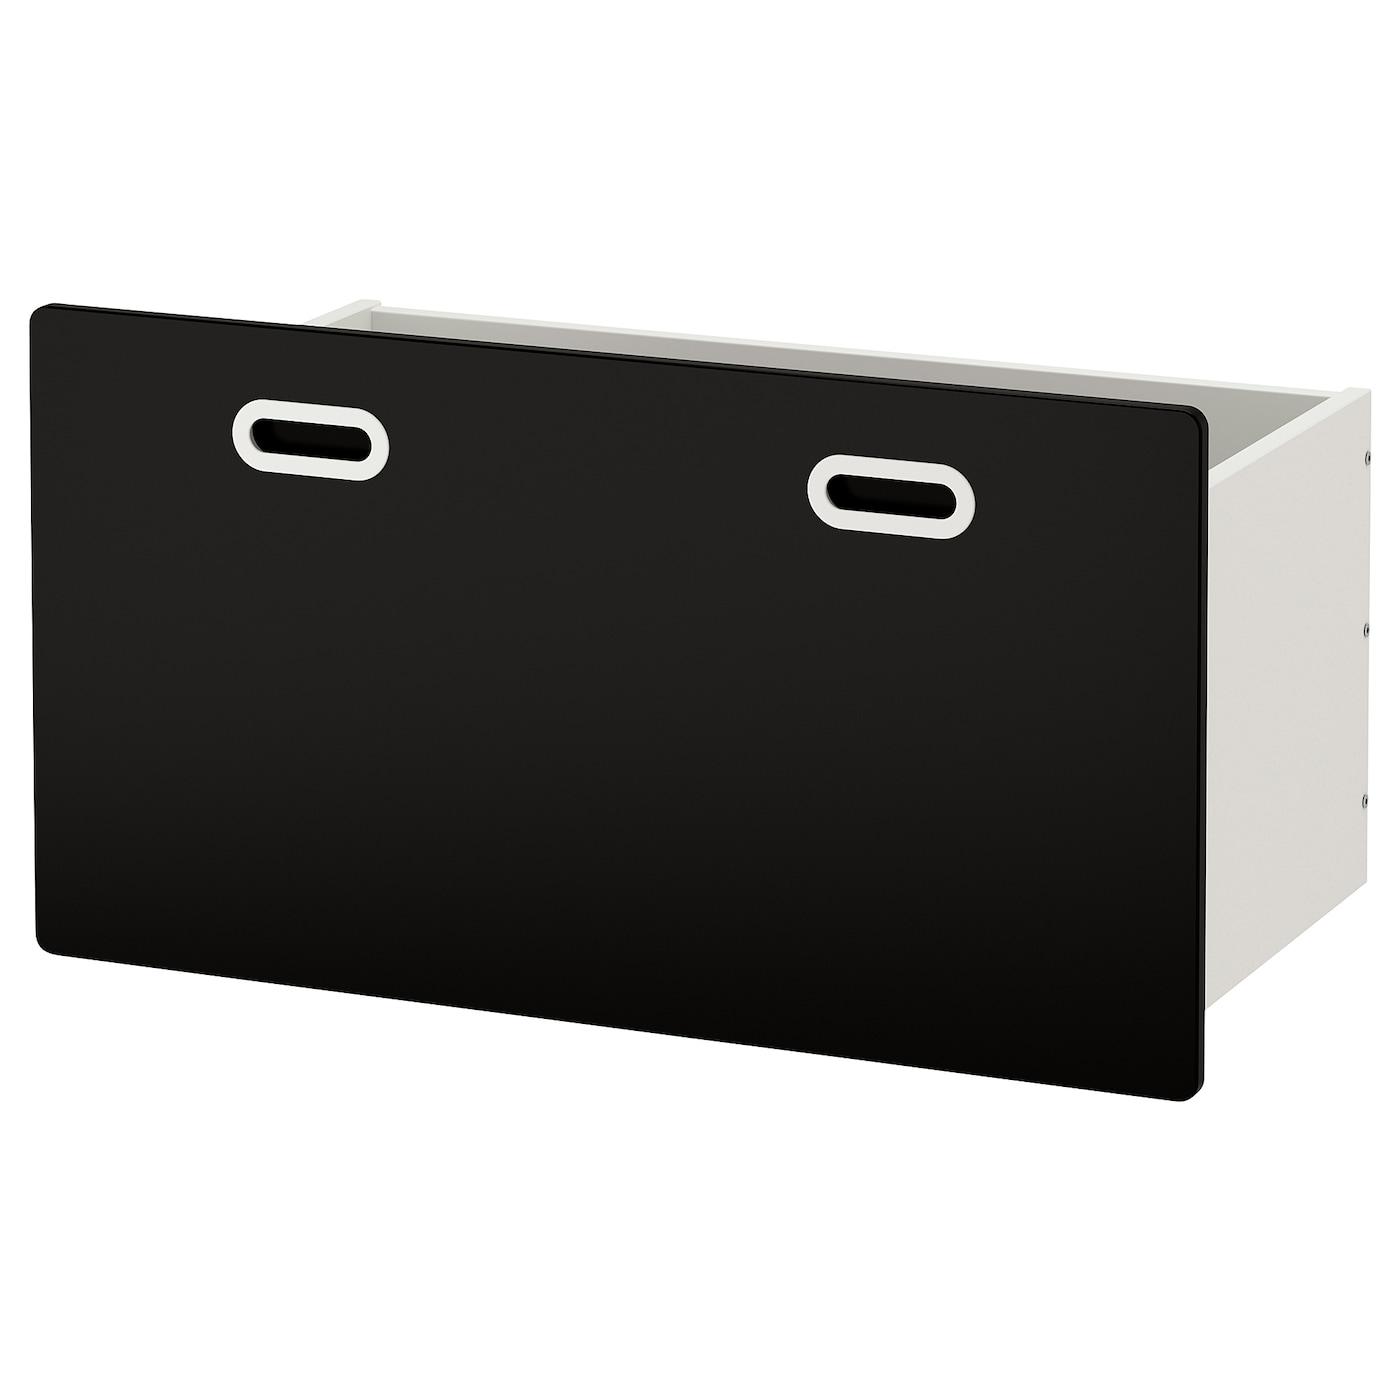 fritids bo te surface tableau noir anthracite 90 x 49 x 48 cm ikea. Black Bedroom Furniture Sets. Home Design Ideas